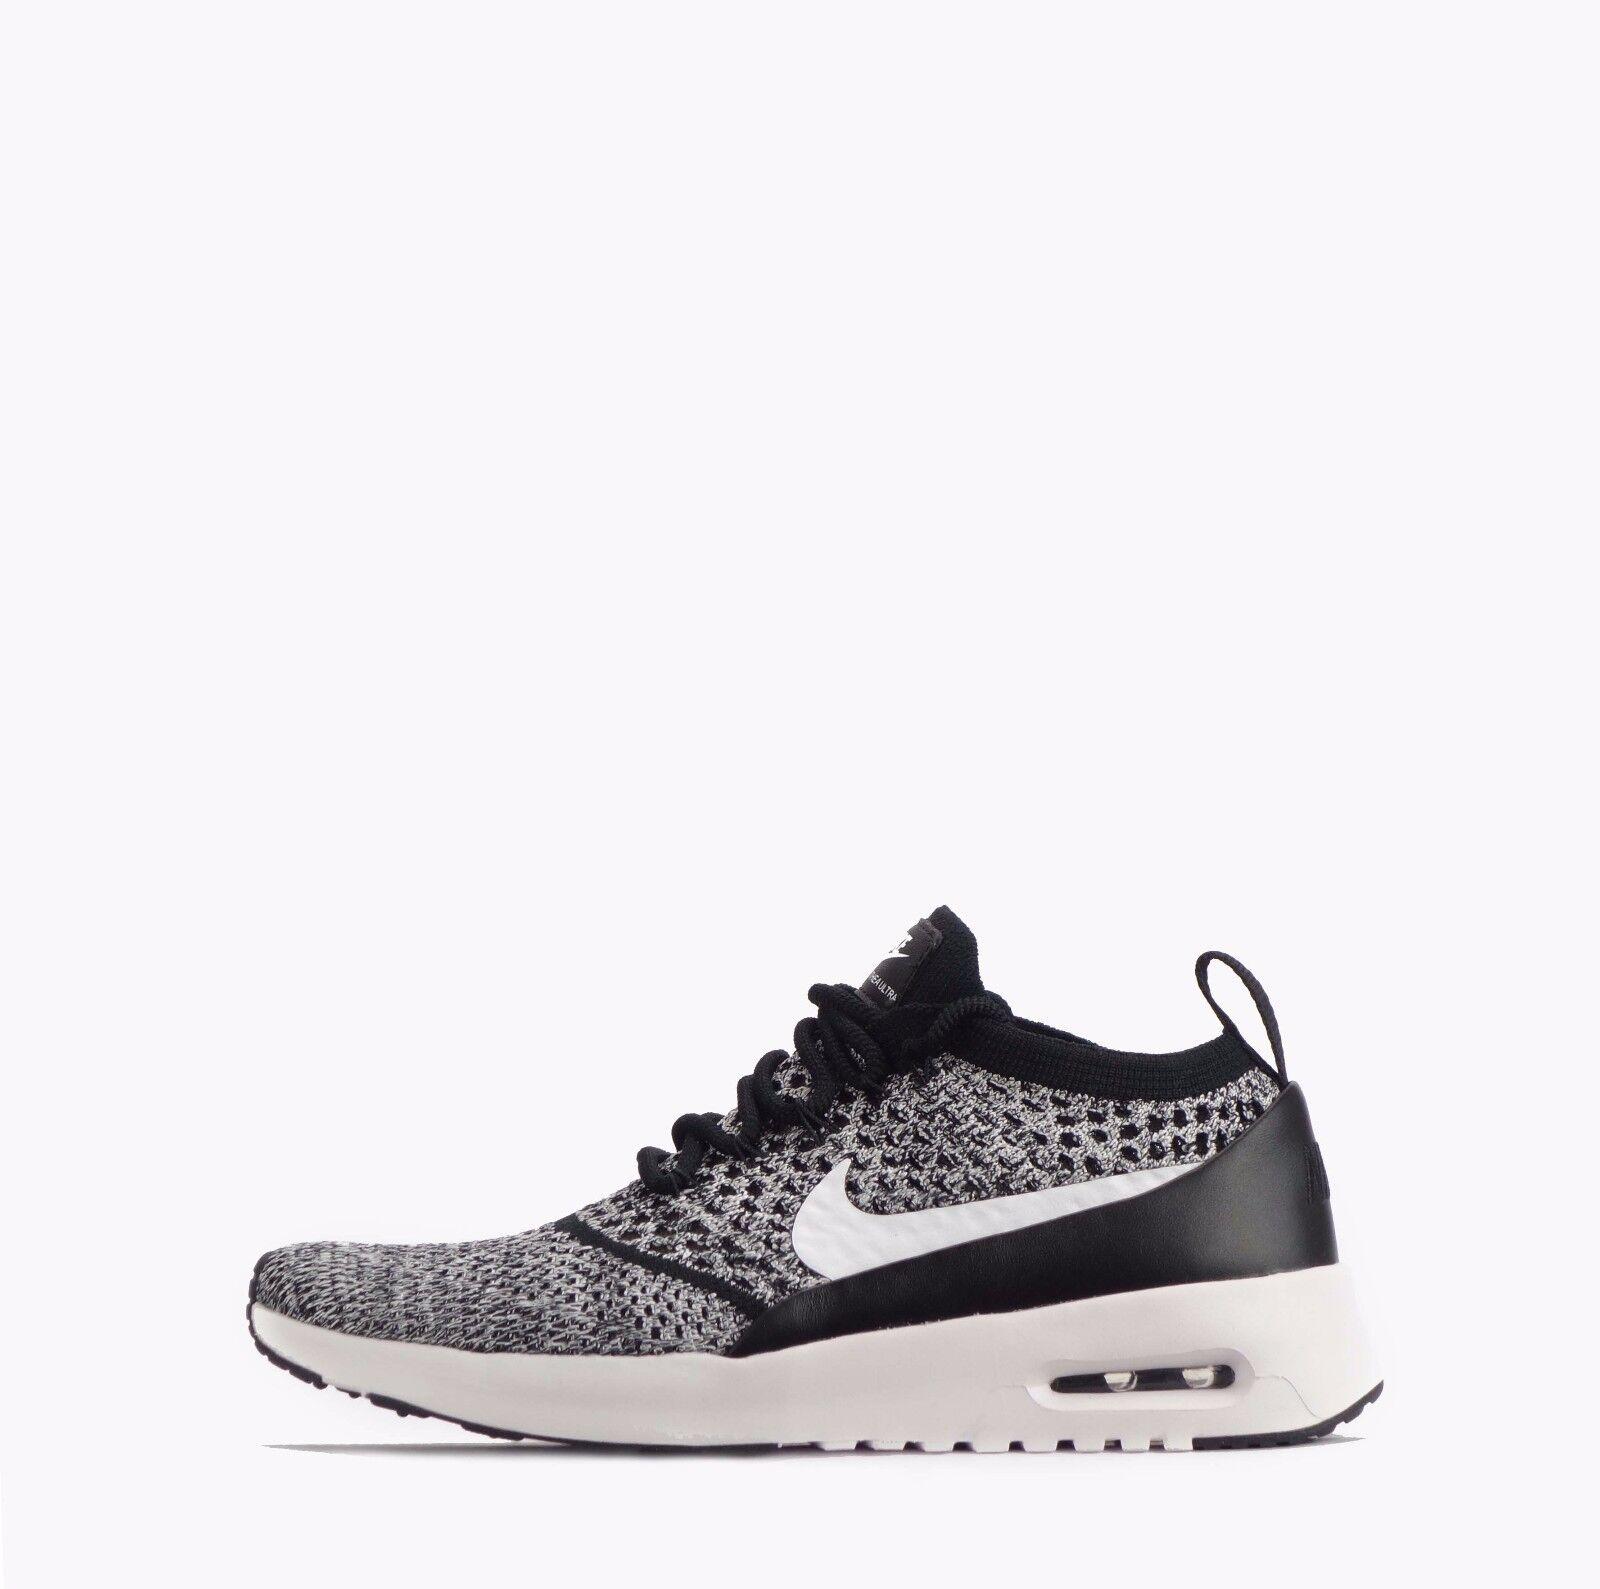 Nike Air Max Thea Ultra Flyknit Women's shoes Black White